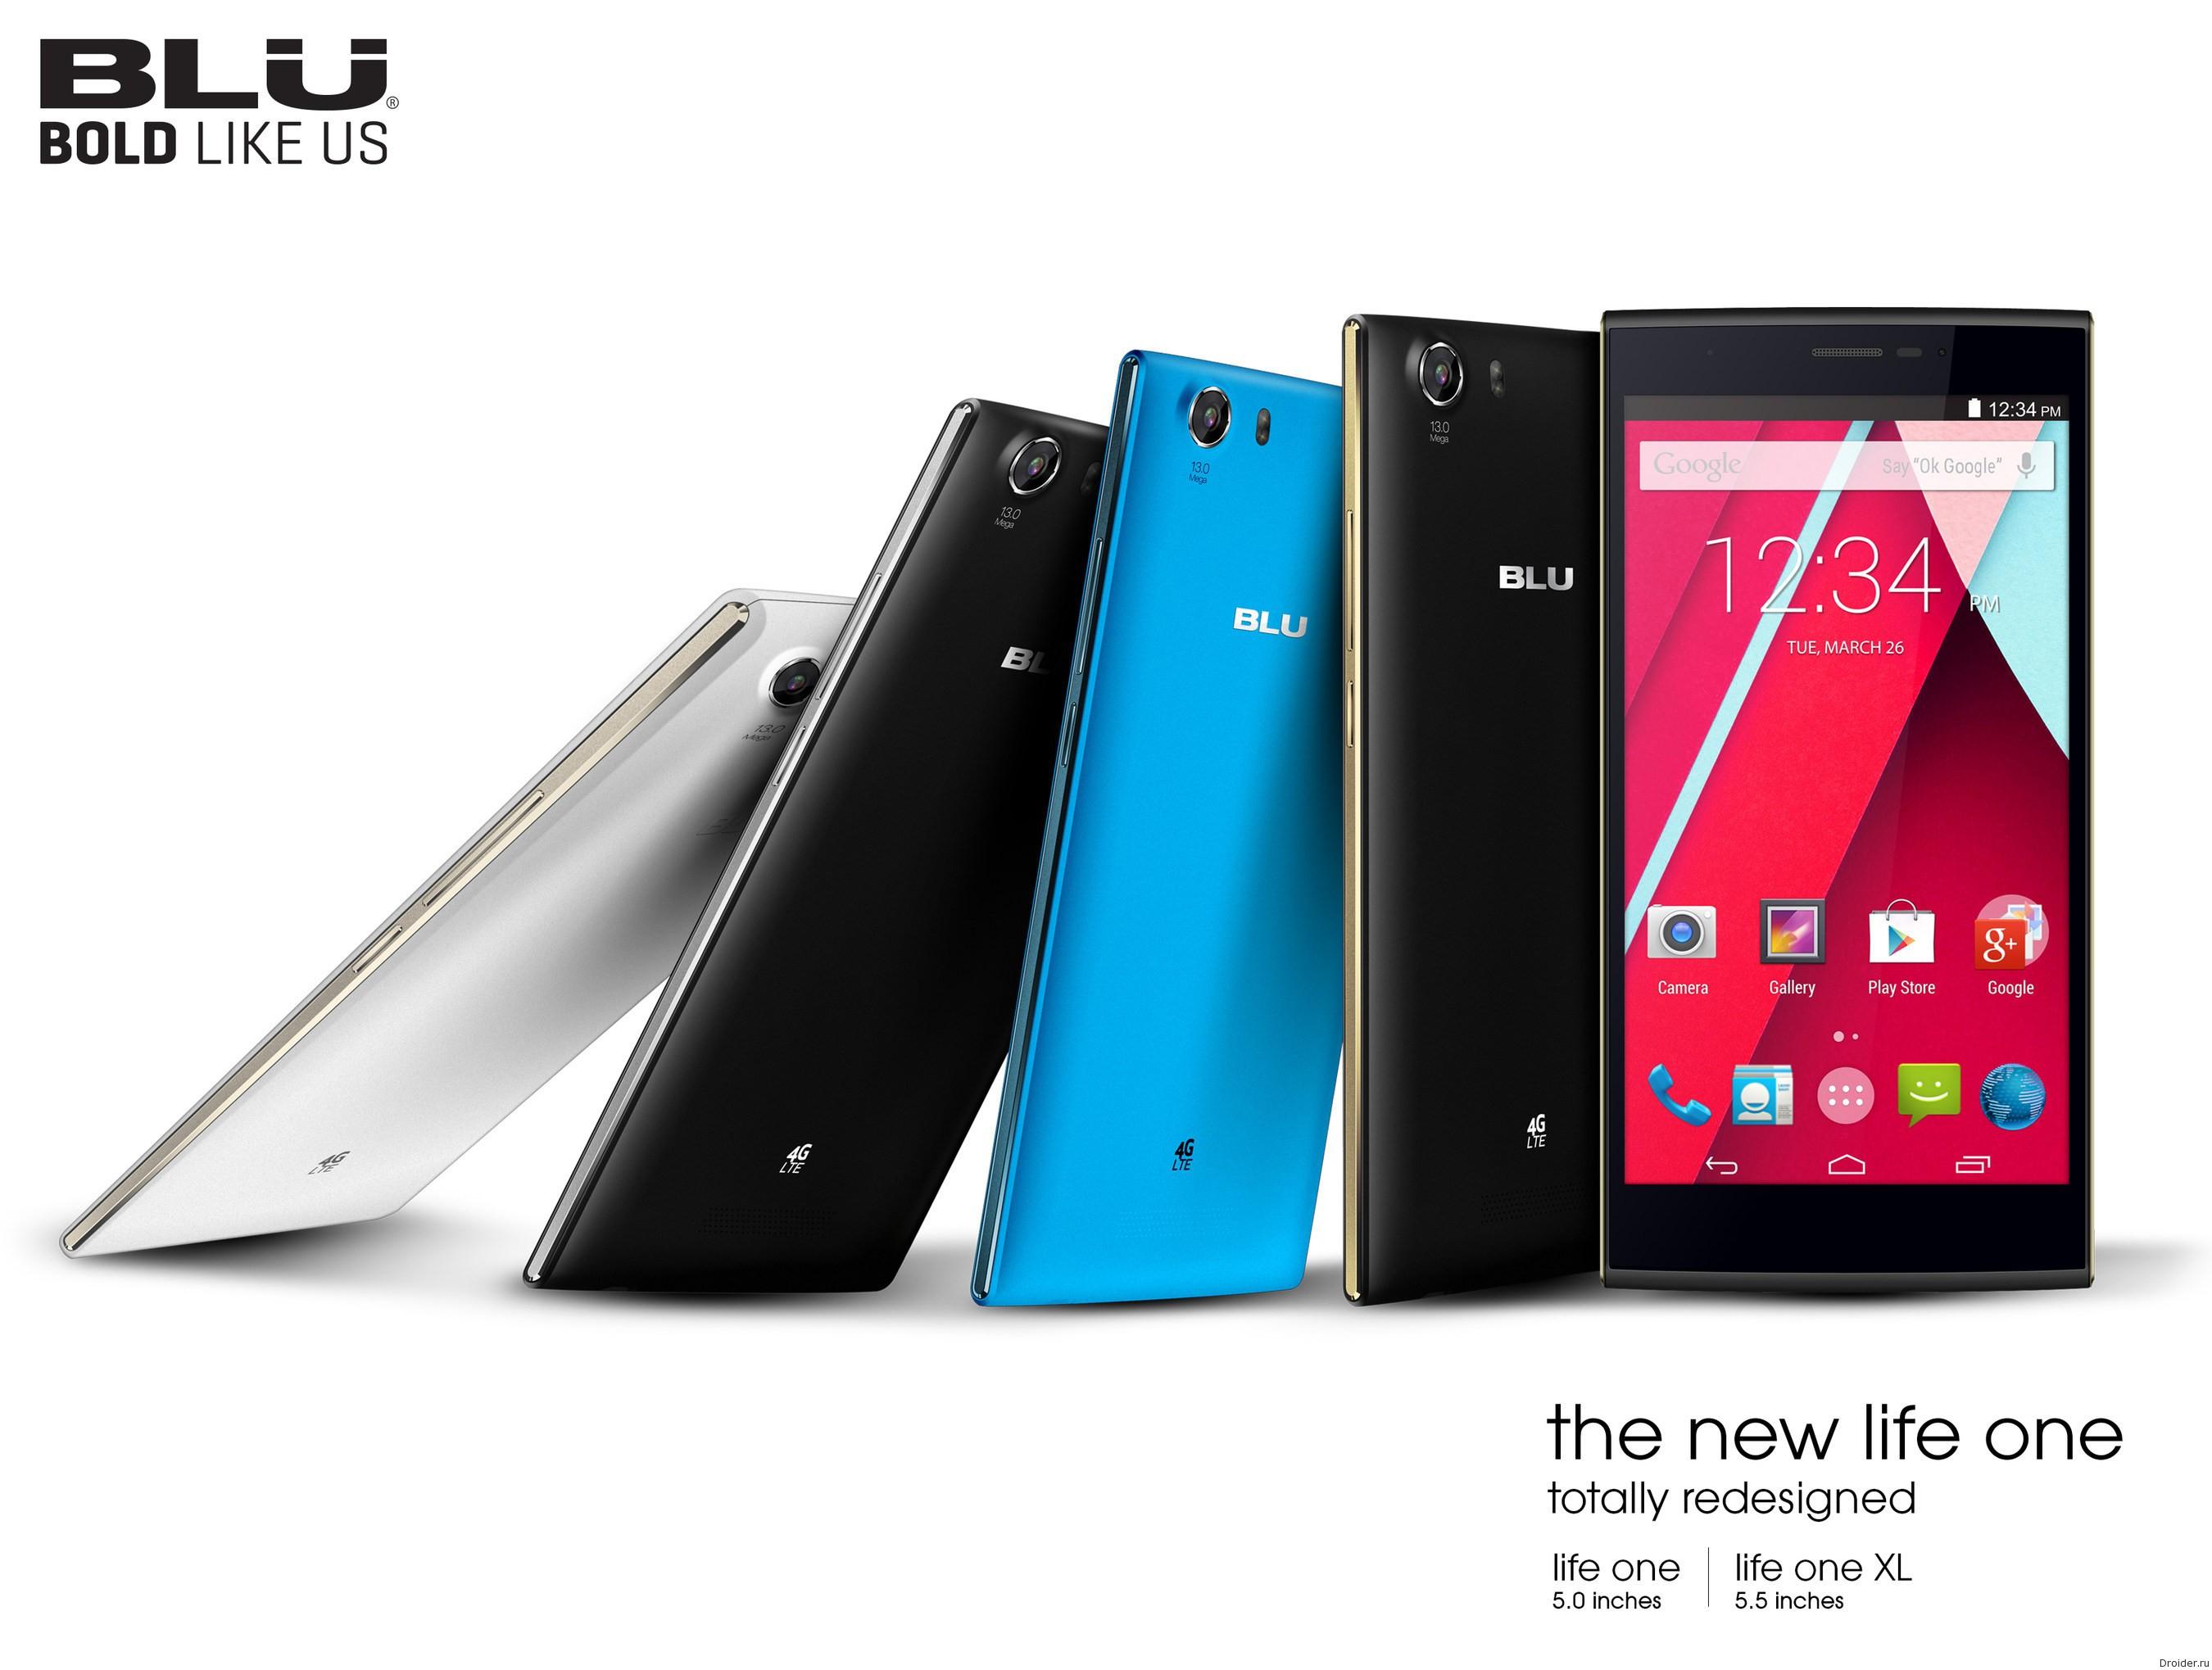 BLU расщедрилась 7 смартфонами на CES 2015